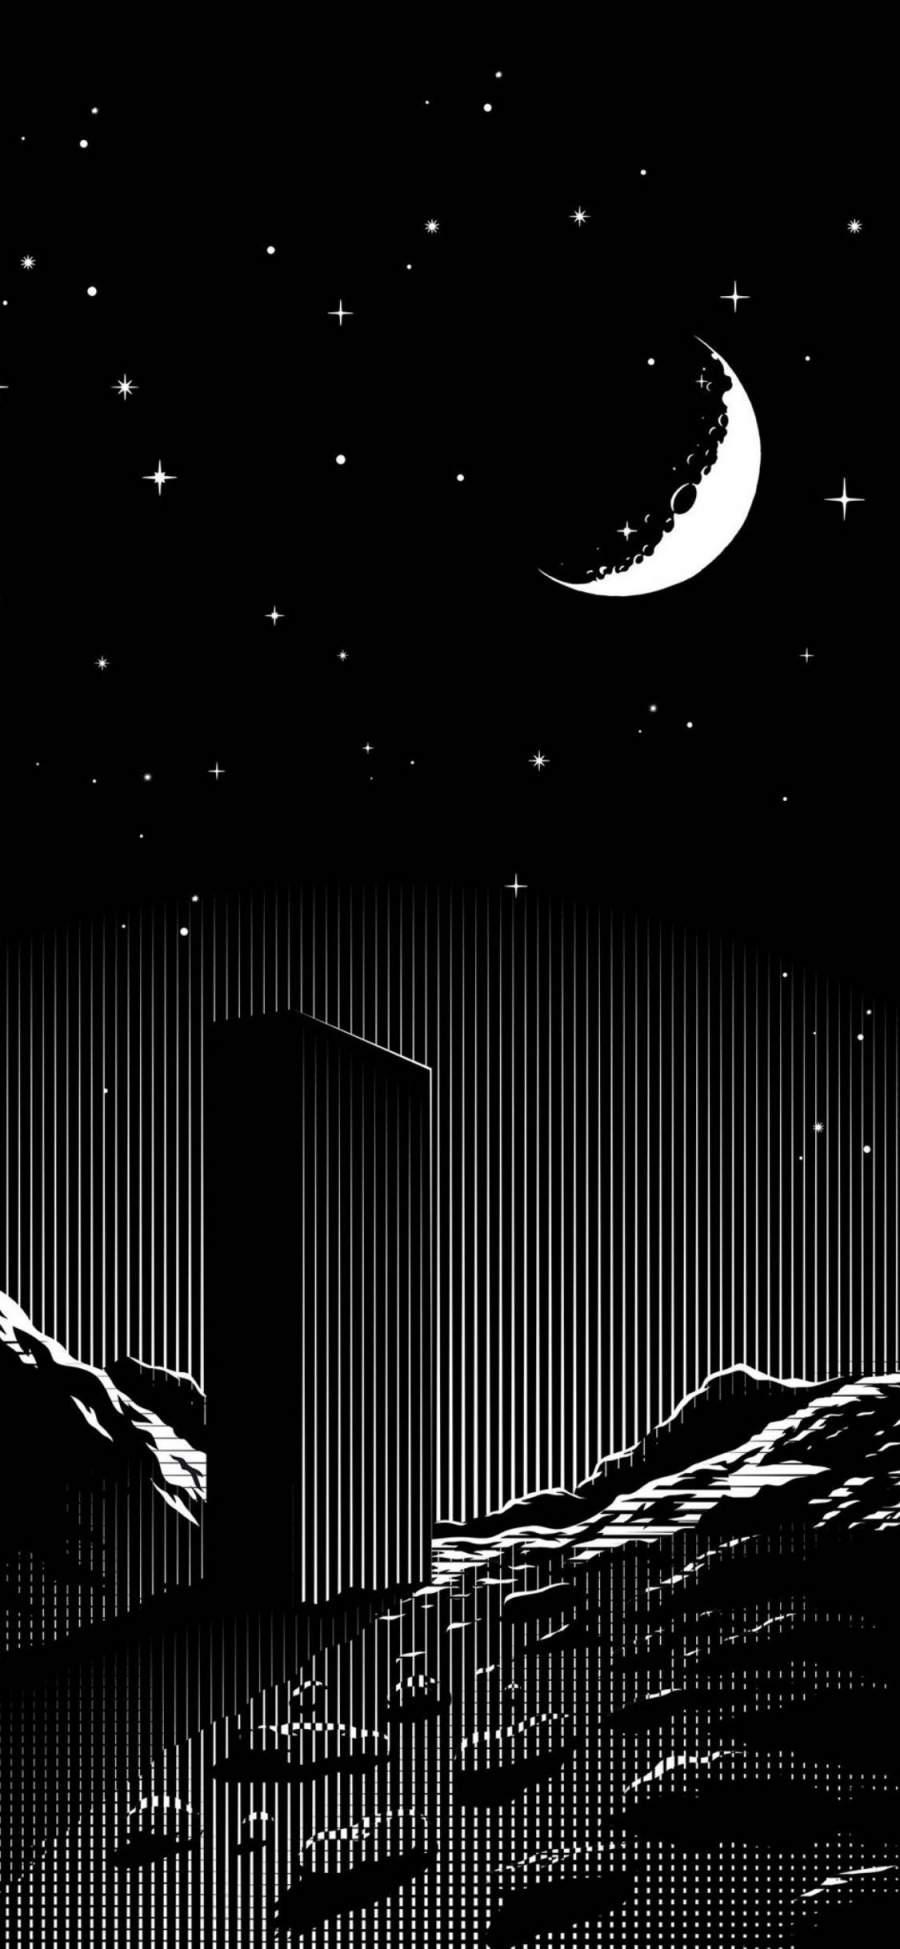 Dark Home Screen Dark Iphone Wallpapers 4k 900x1949 Download Hd Wallpaper Wallpapertip